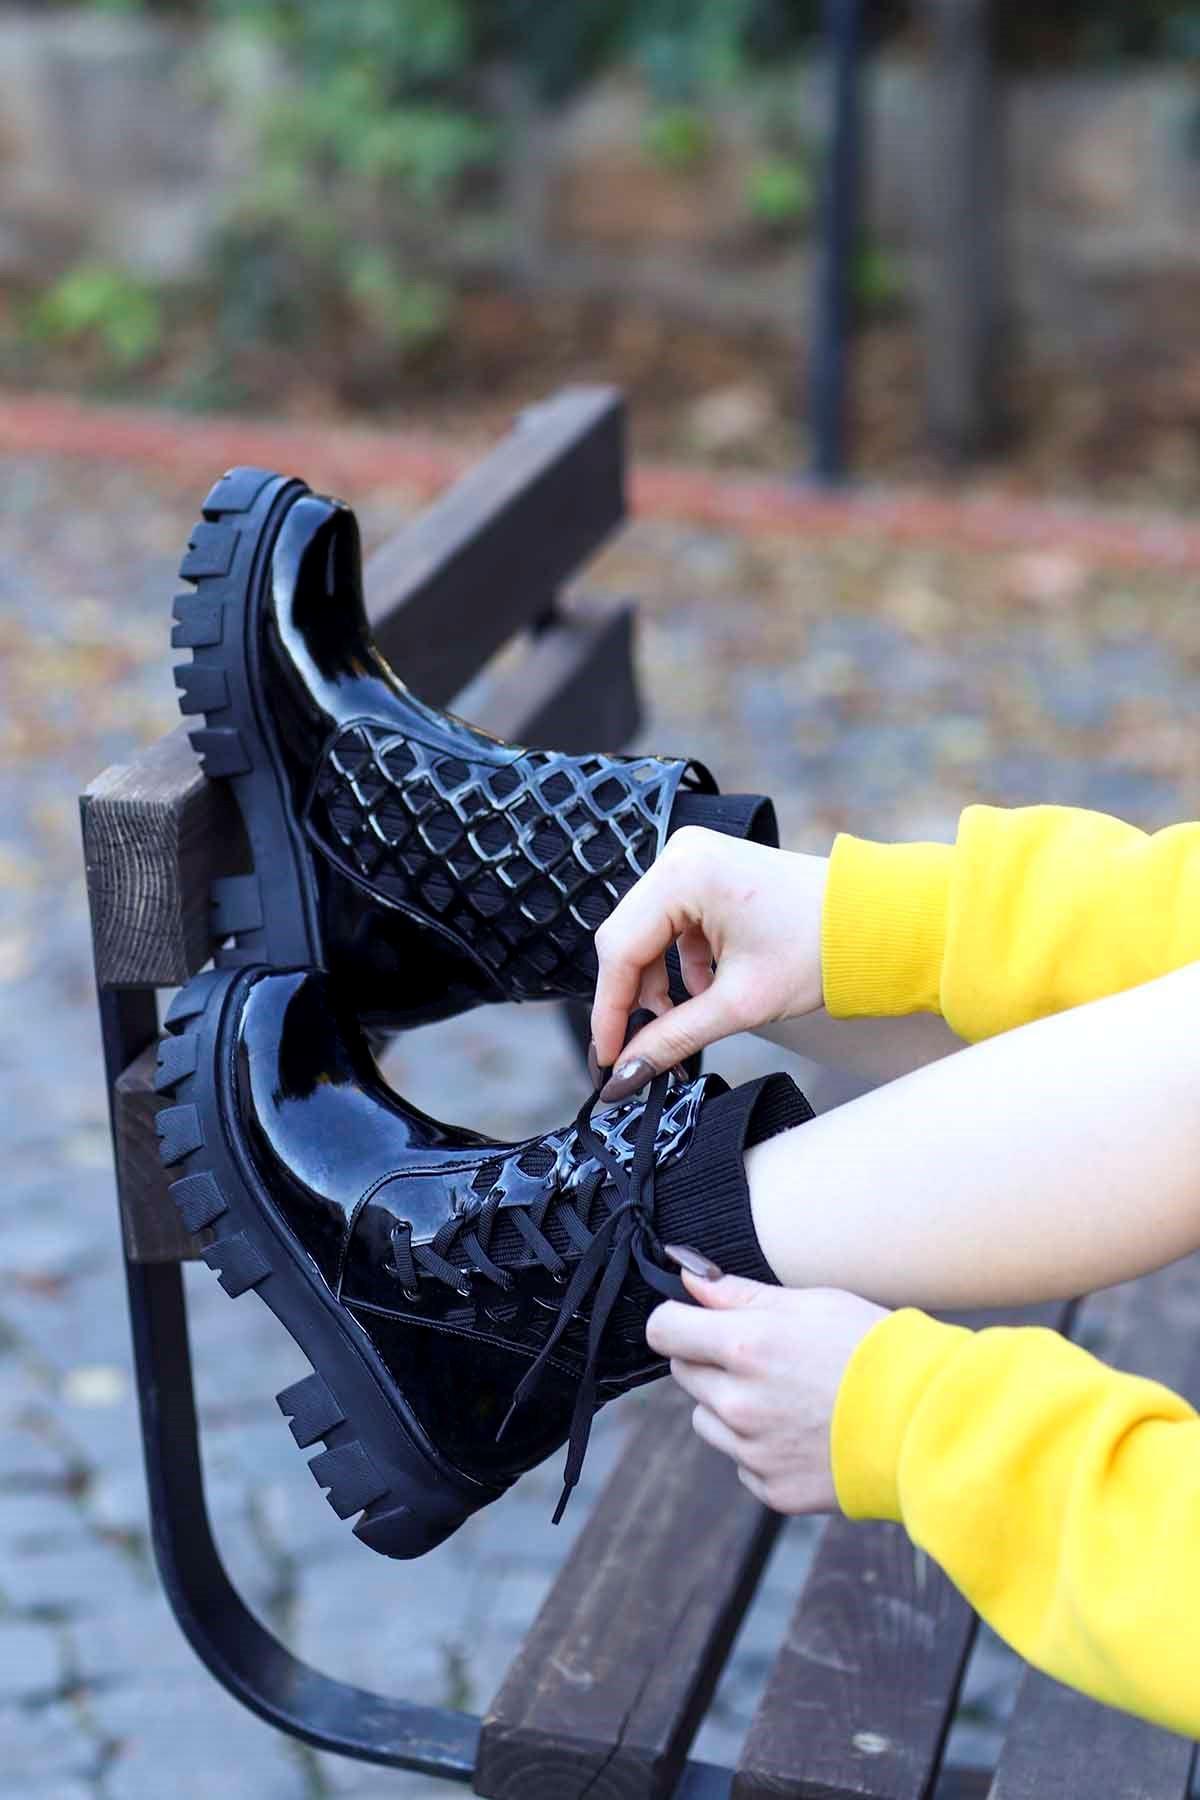 Kcl-255 Çorap Triko Bot Siyah Rugan